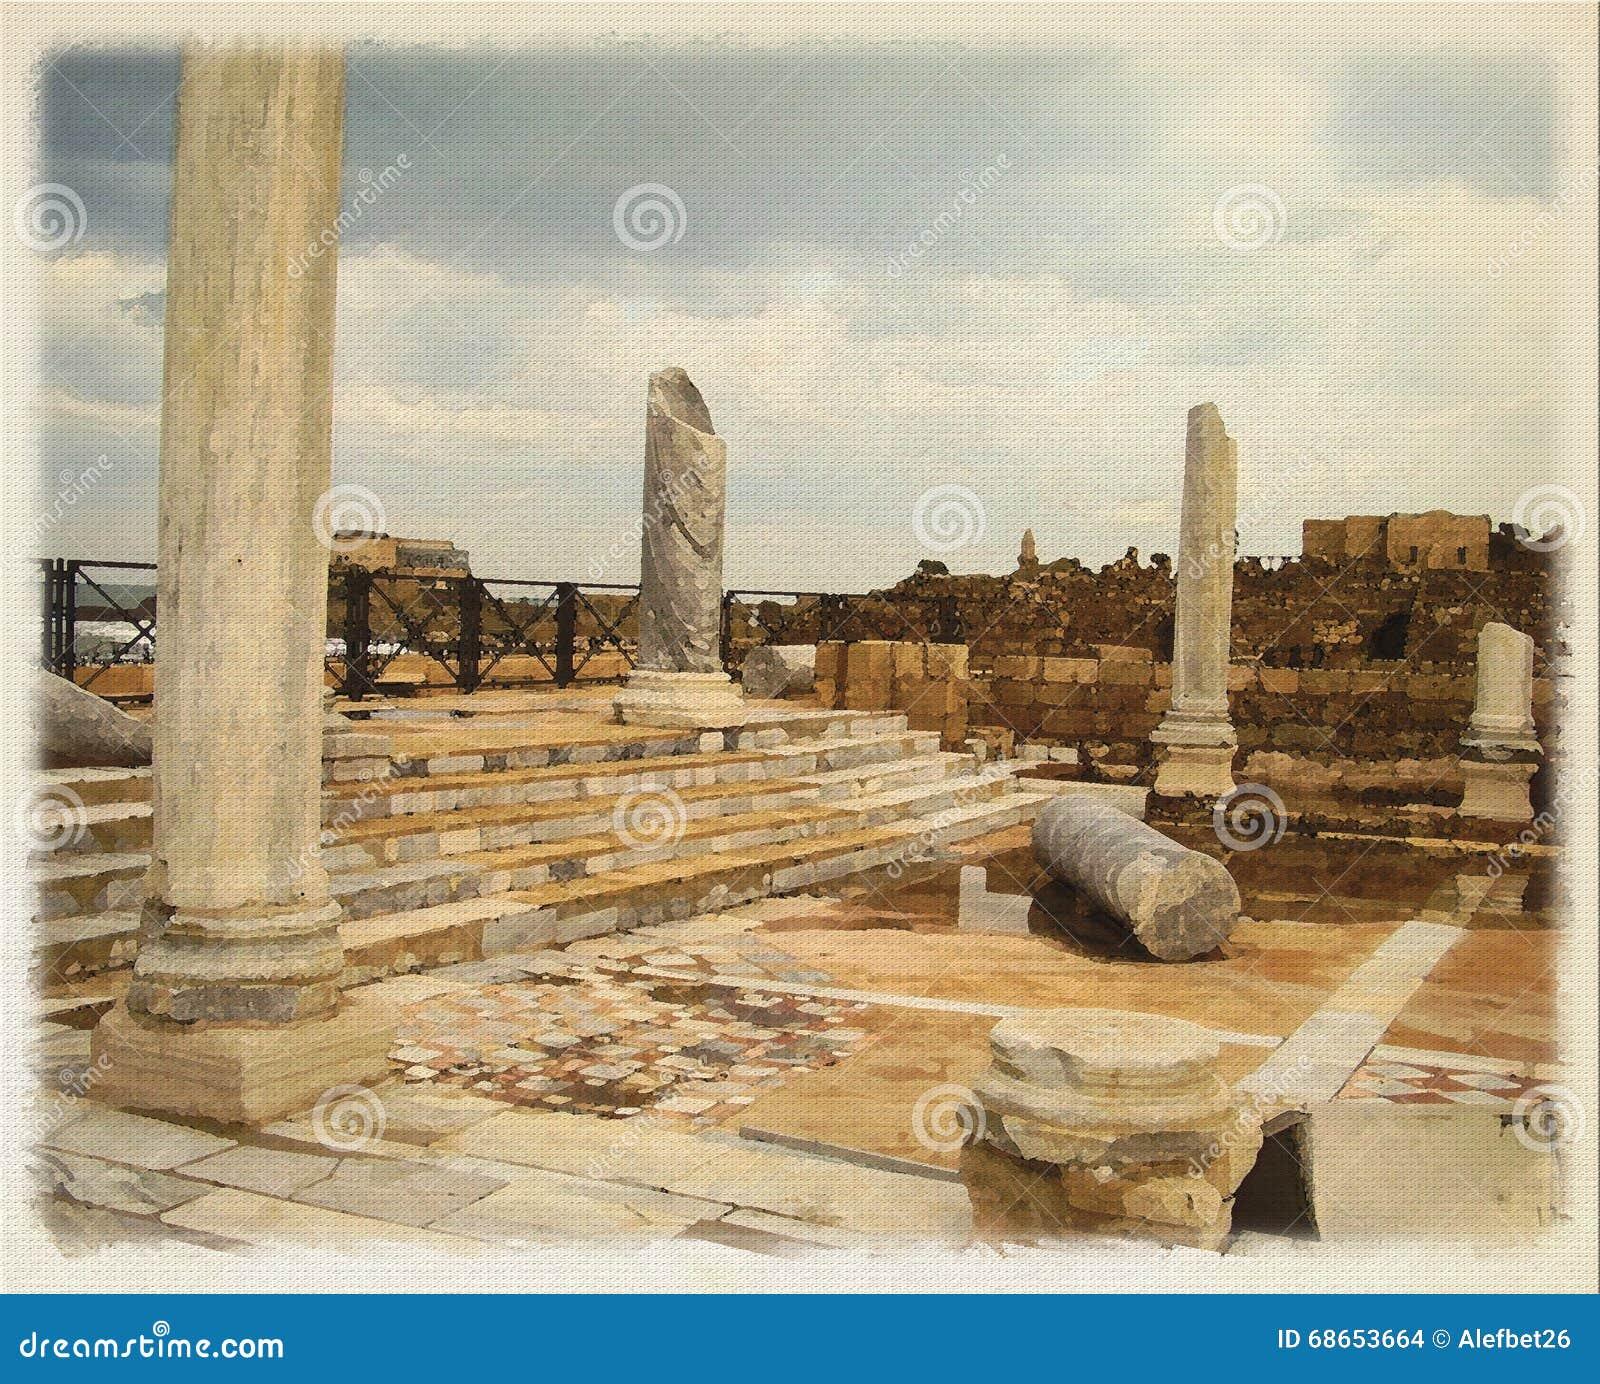 Imitation de Digital de la peinture d aquarelle, ruines du palais de Herod